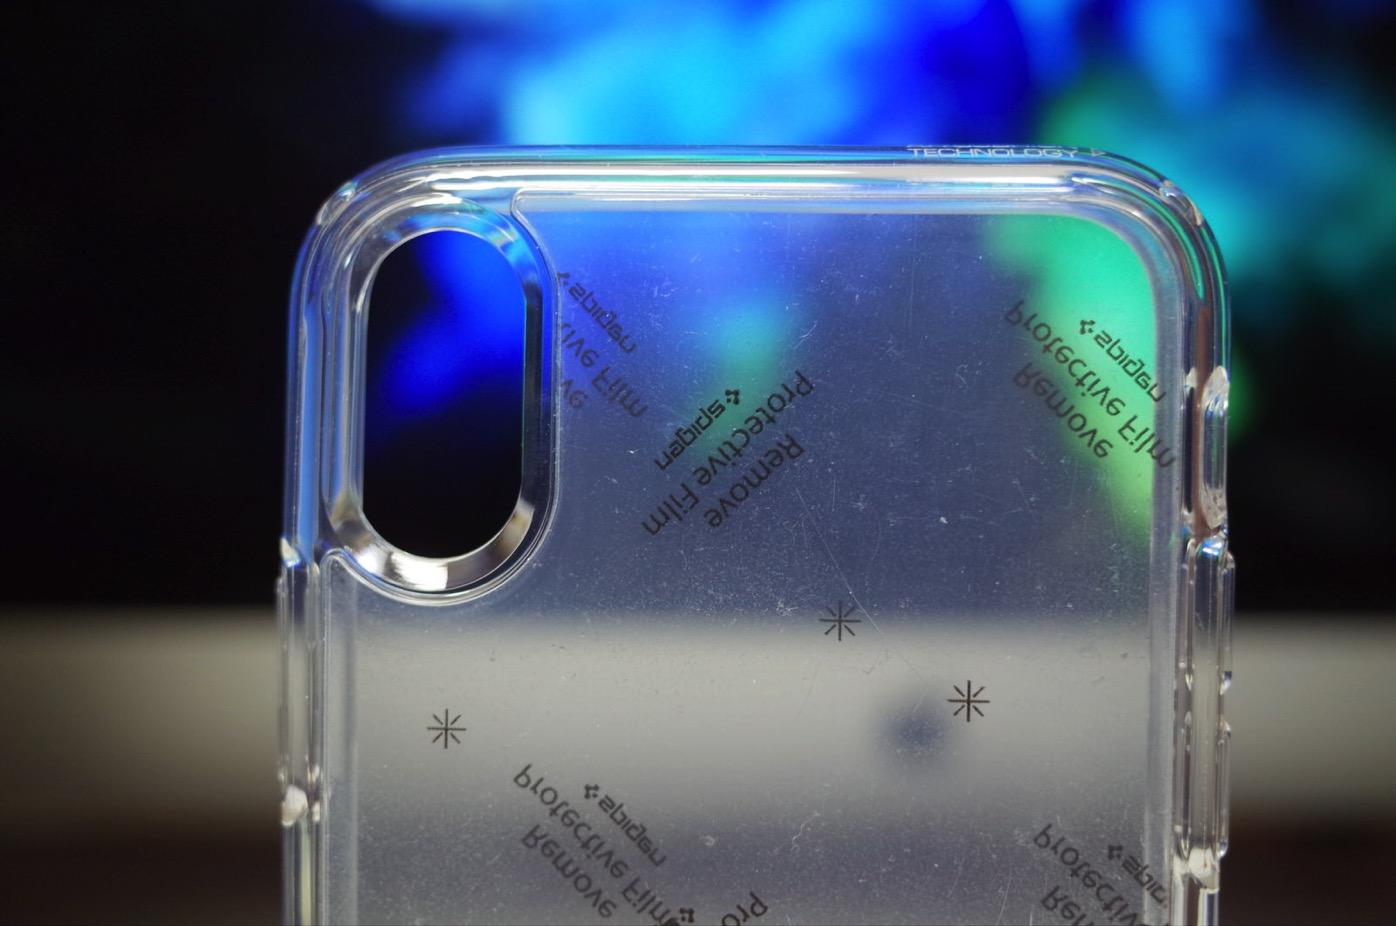 【Spigen】iPhone X ケース, [ 米軍MIL規格取得 落下 衝撃 吸収 ] ウルトラ・ハイブリッド アイフォン X 用 耐衝撃 カバー-7